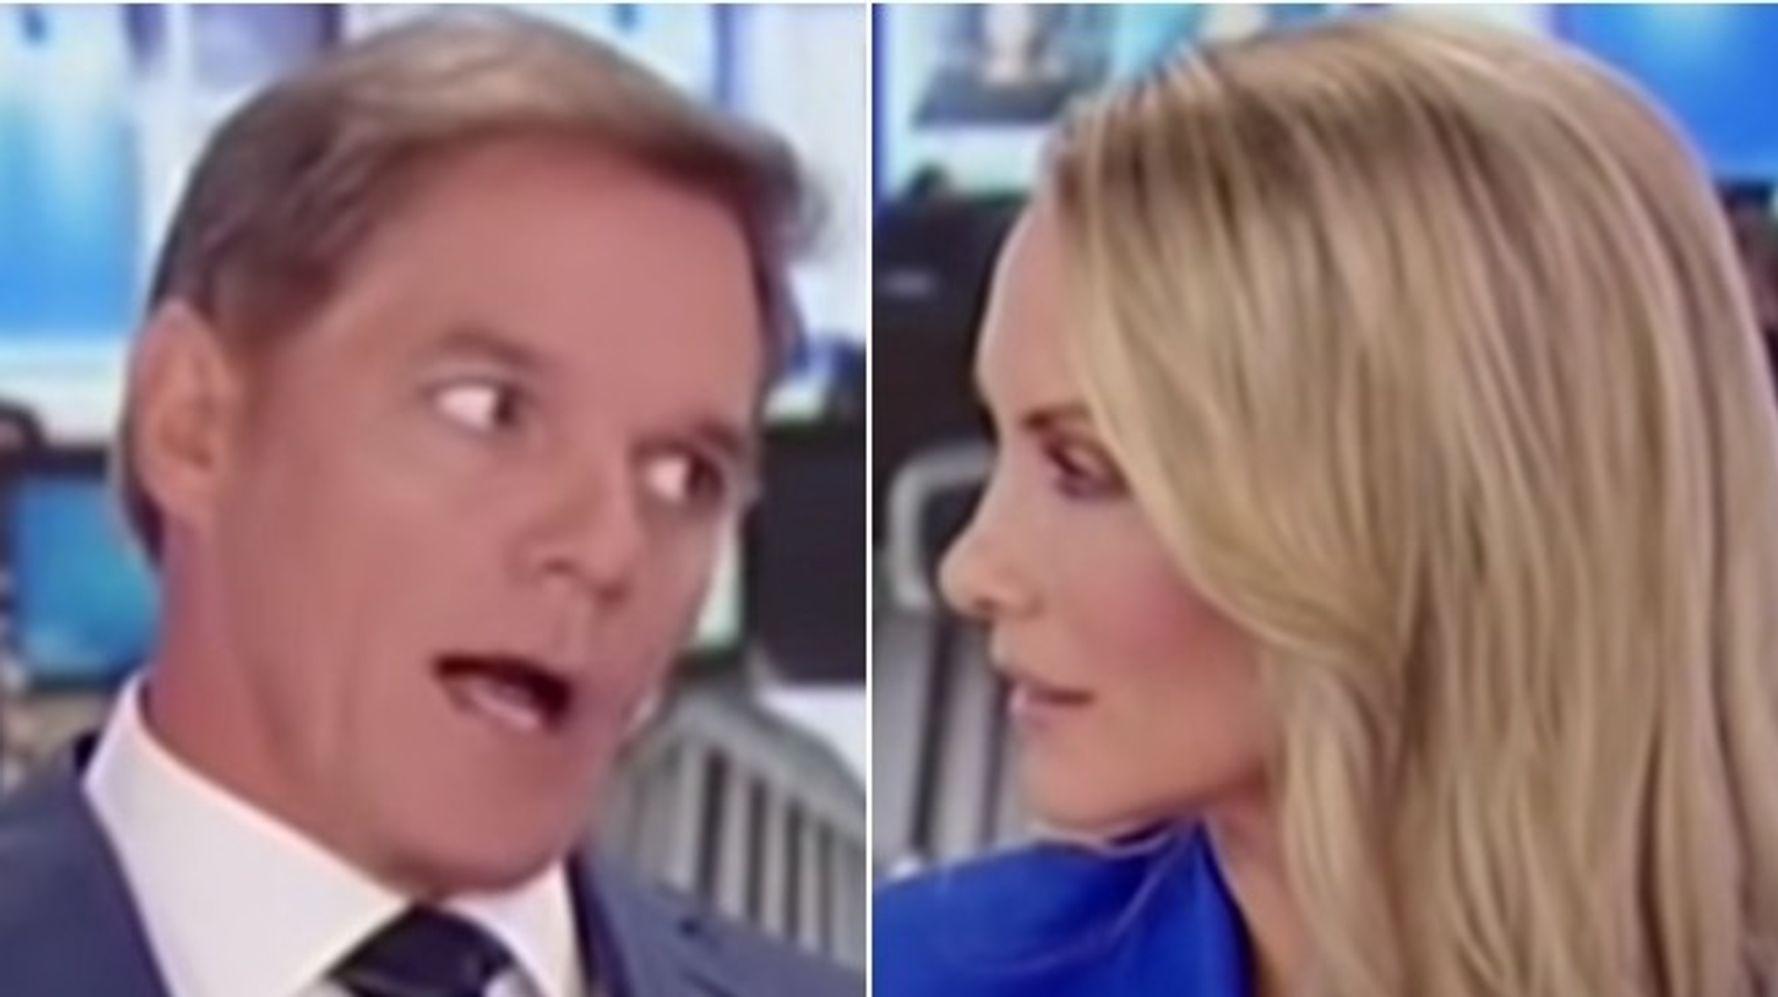 Fox News's 'Craziest Trump Lie Yet' Revealed In 'Late Show' Segment